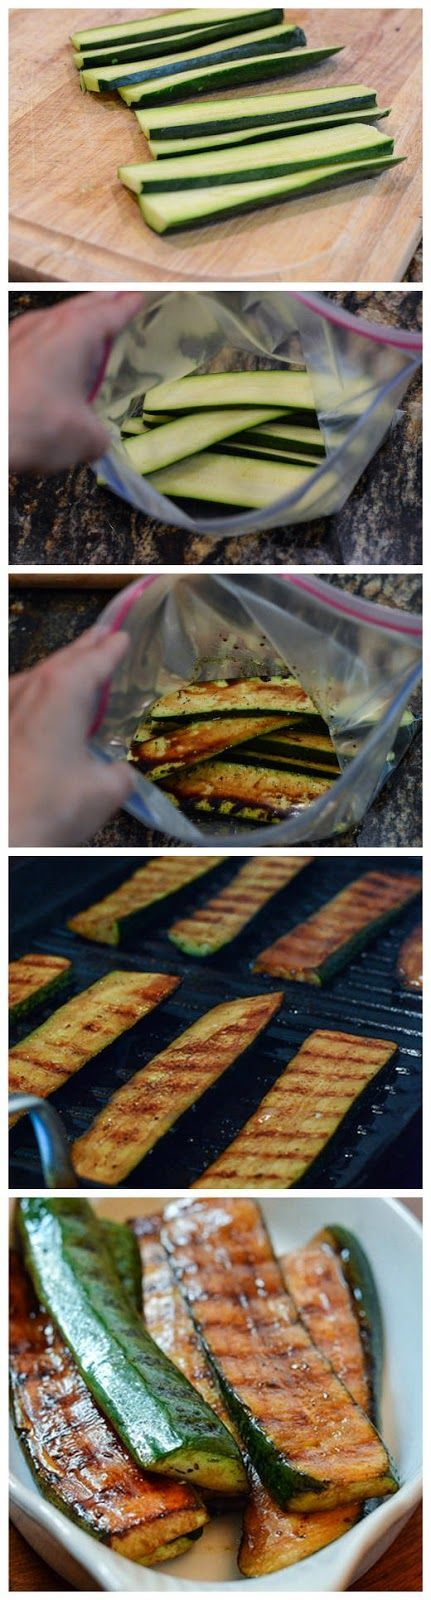 Balsamic Grilled Zucchini | CookJino